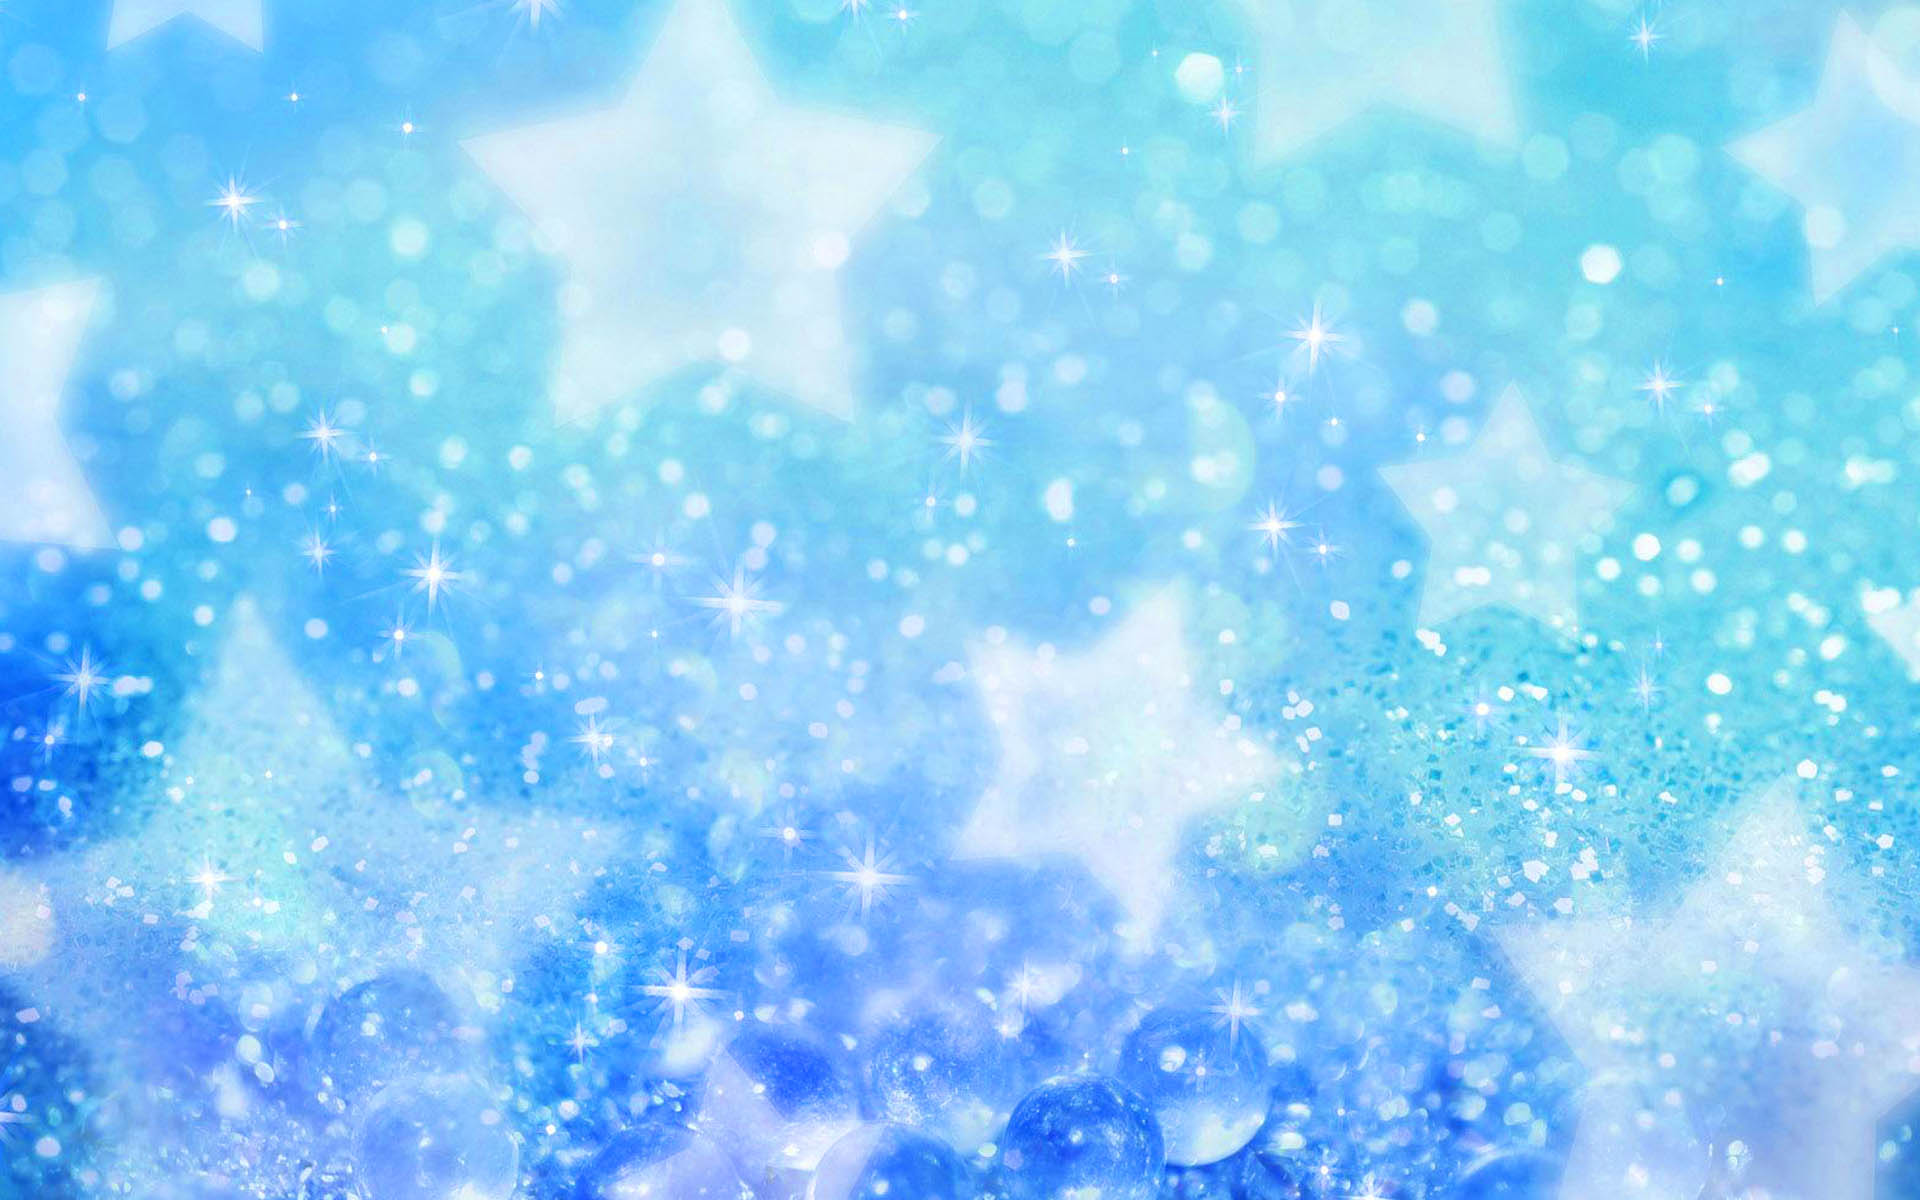 Blue Glitter Graphics Creative Graphics Art Star HD Wallpapers 1920x1200